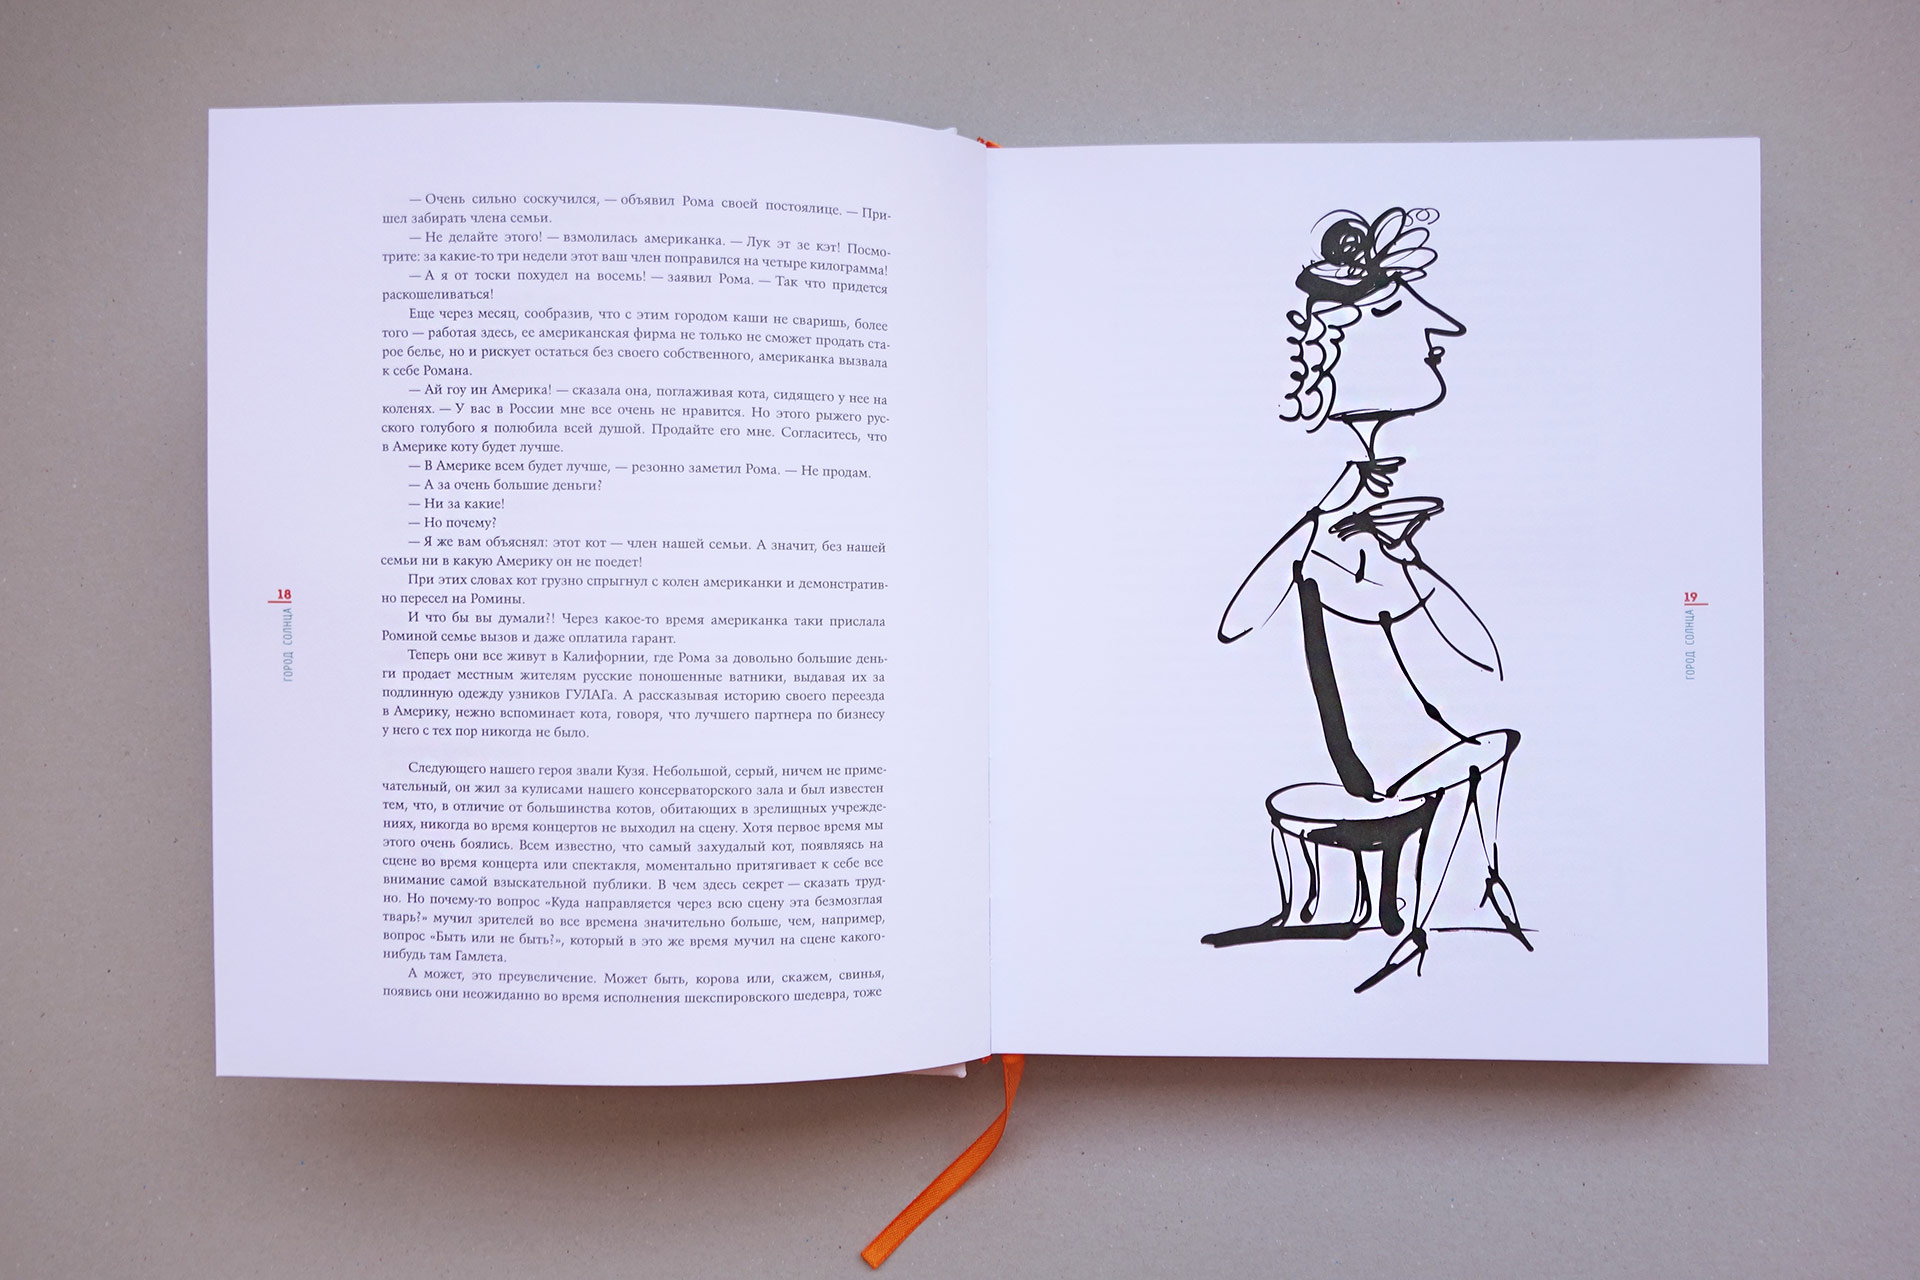 Asgard Branding, anniversary album, printed publications, book design, George Golubenko, Michael Reva, illustrations